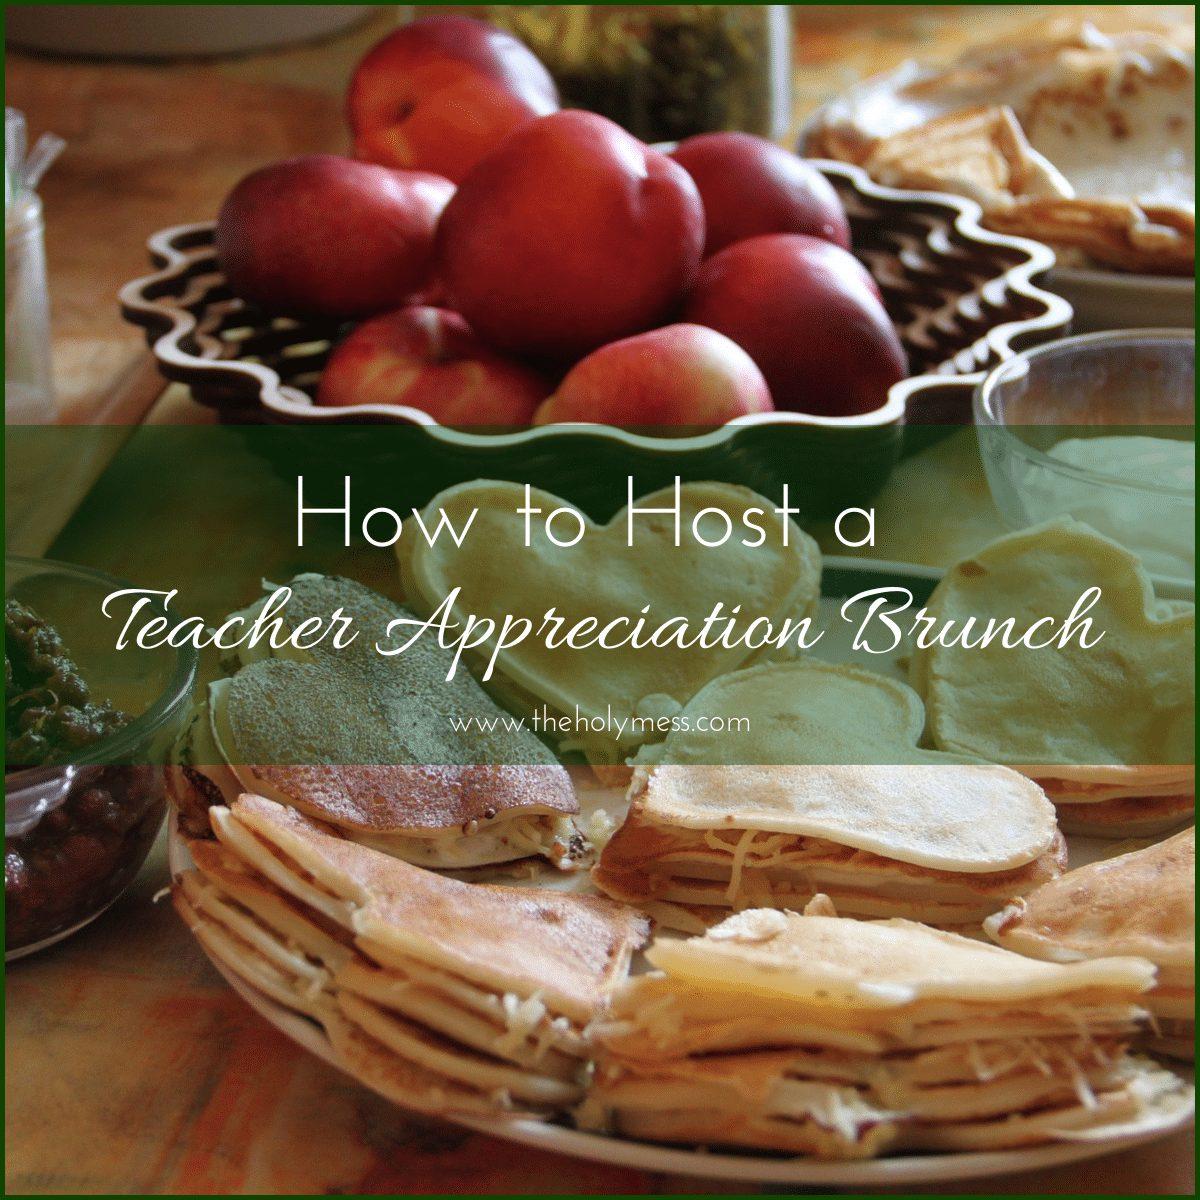 How to Host a Teacher Appreciation Brunch|The Holy Mess